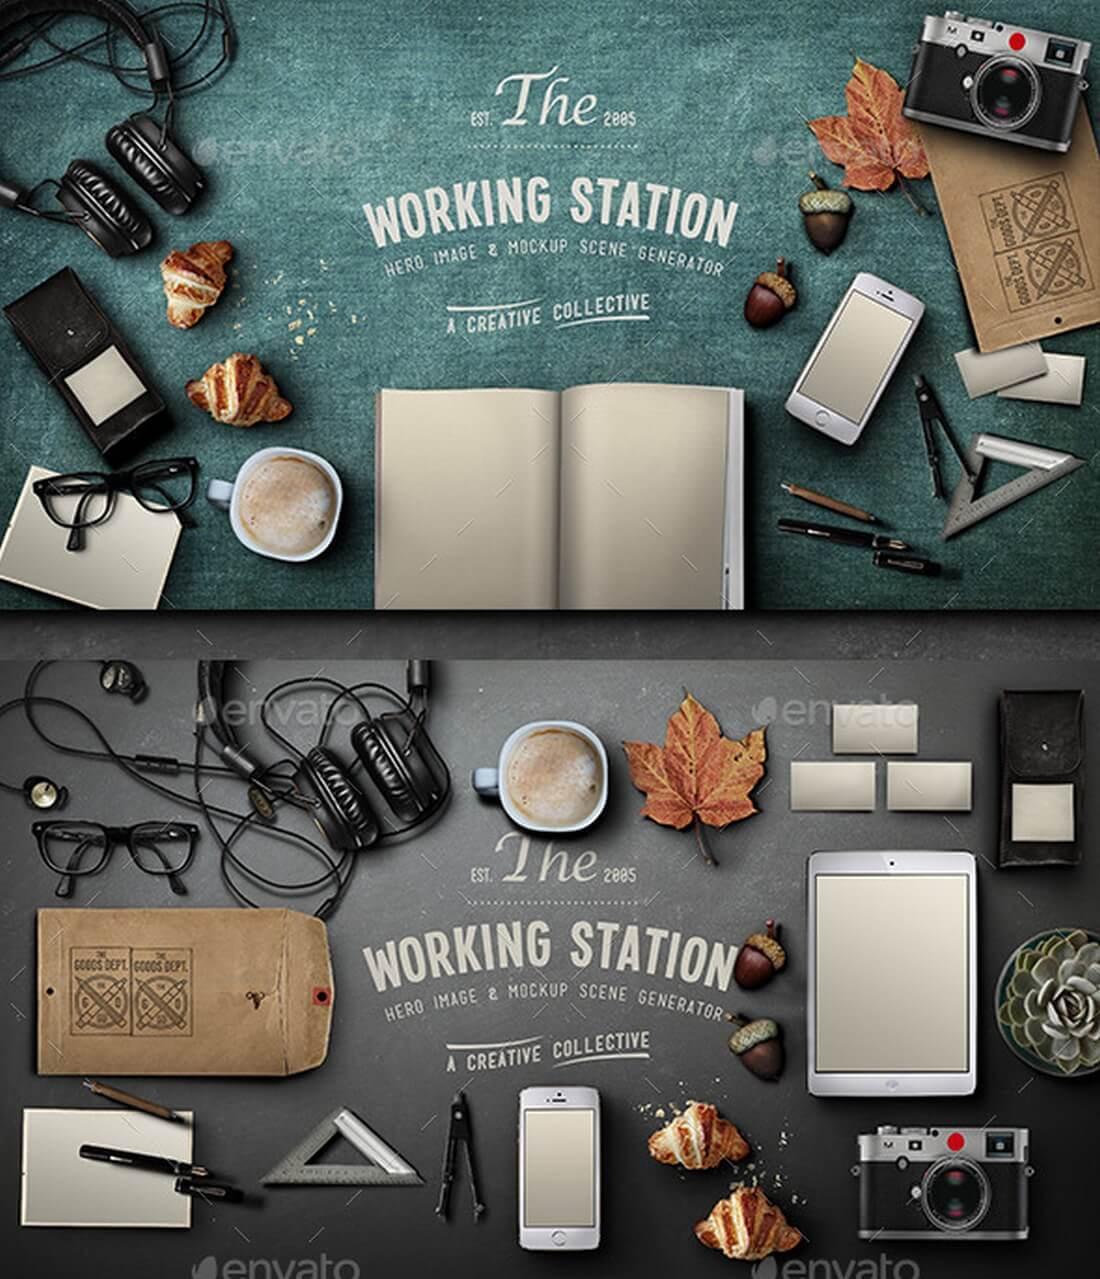 working-station-hero-image